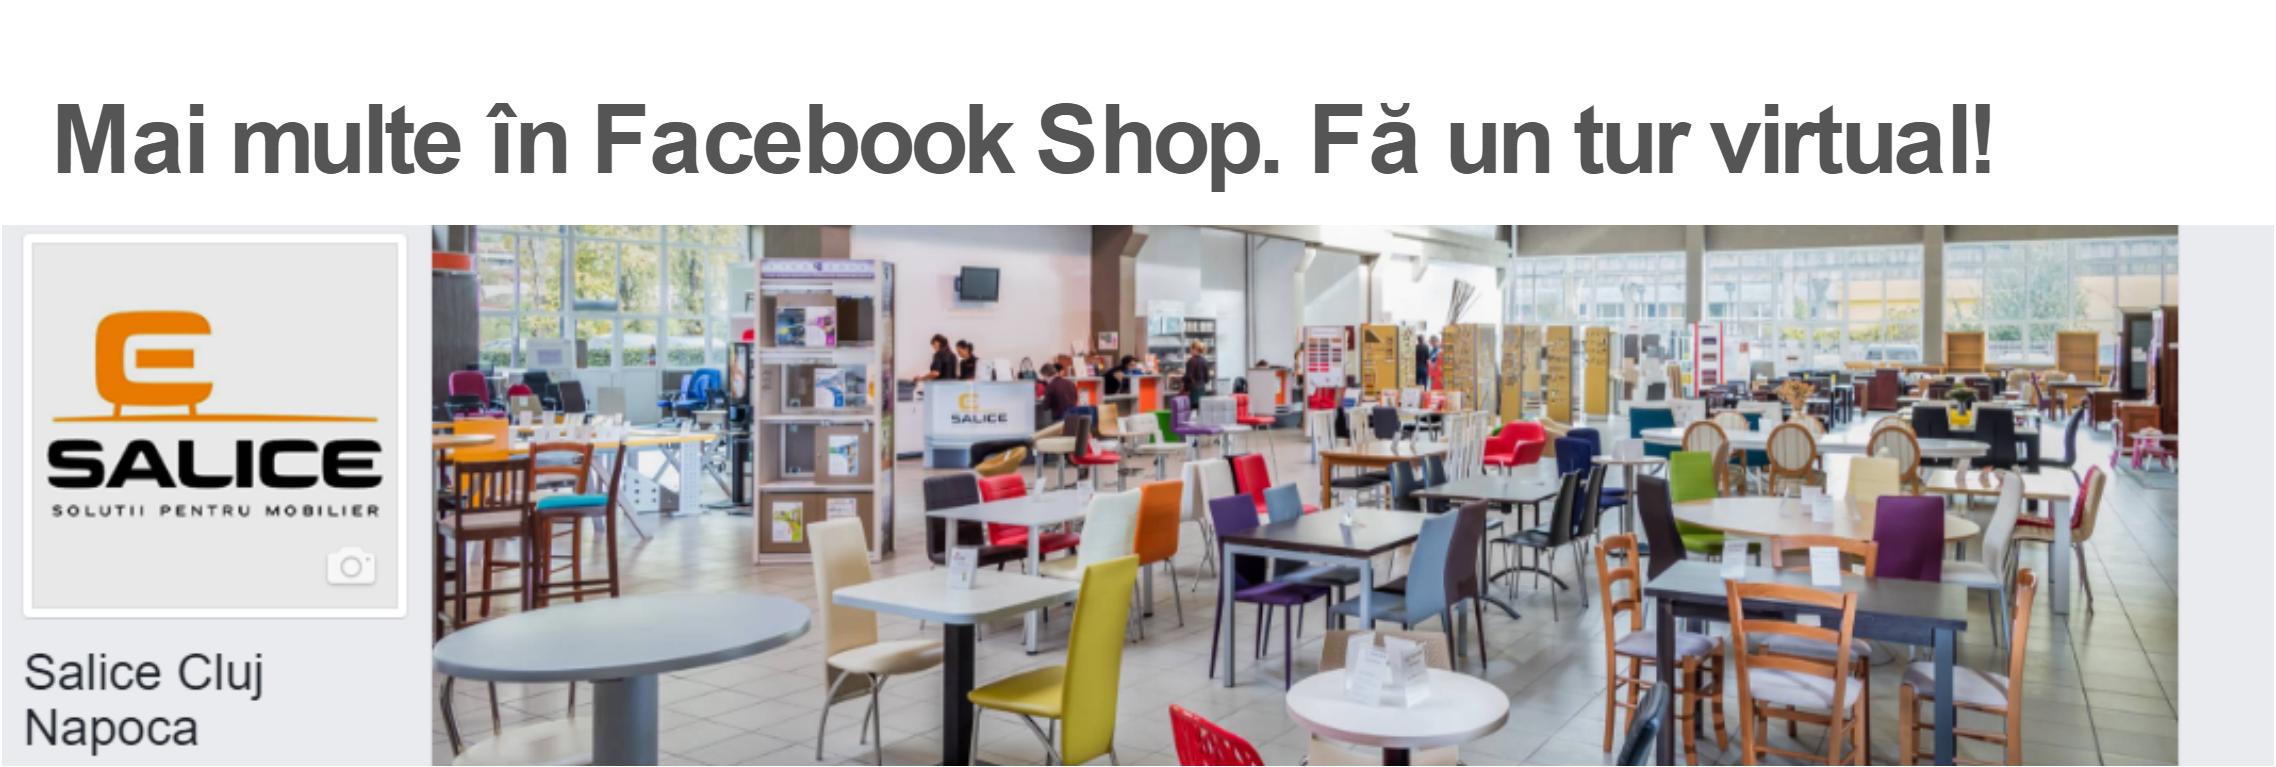 Facebook shop Salice